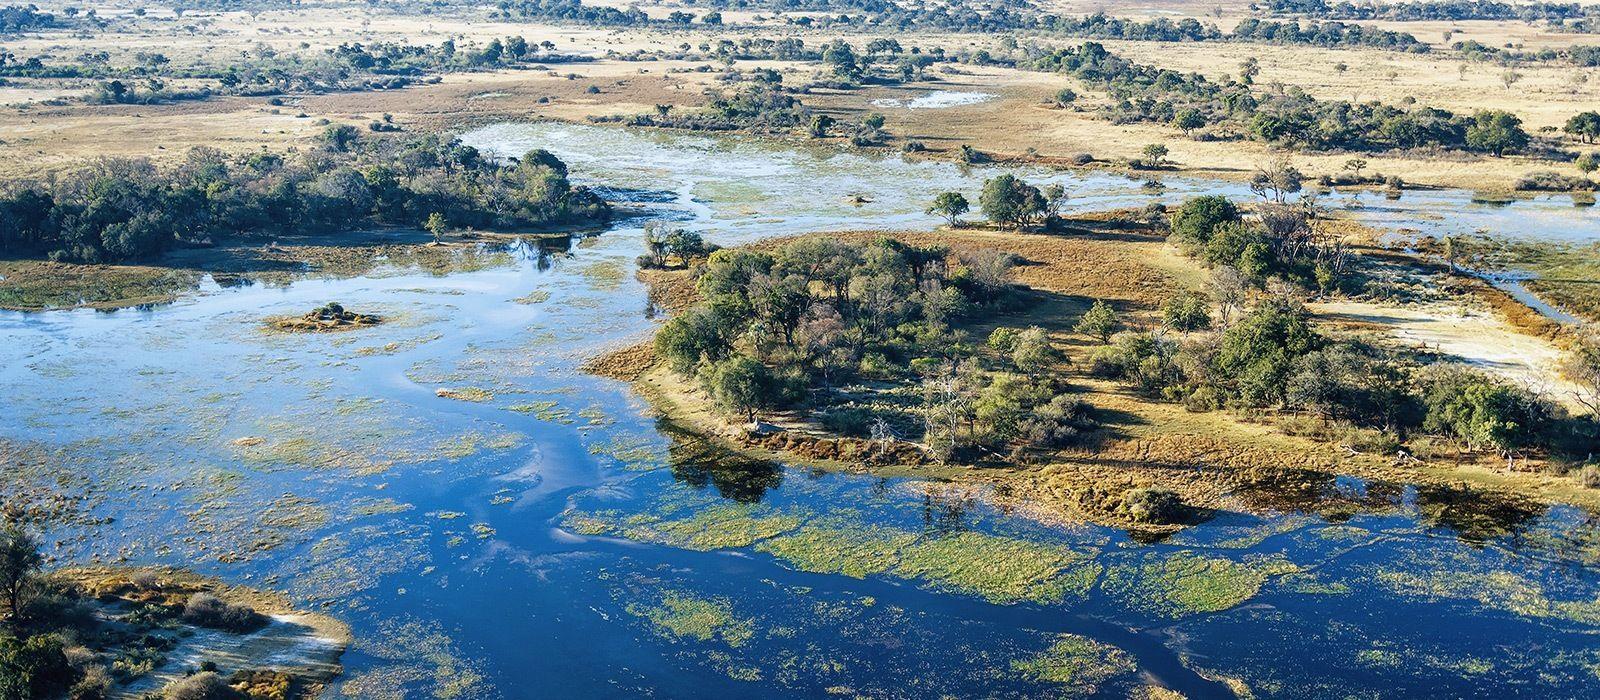 Südafrika, Sambia & Botswana: Safaris, Wein und Wasserfälle Urlaub 3